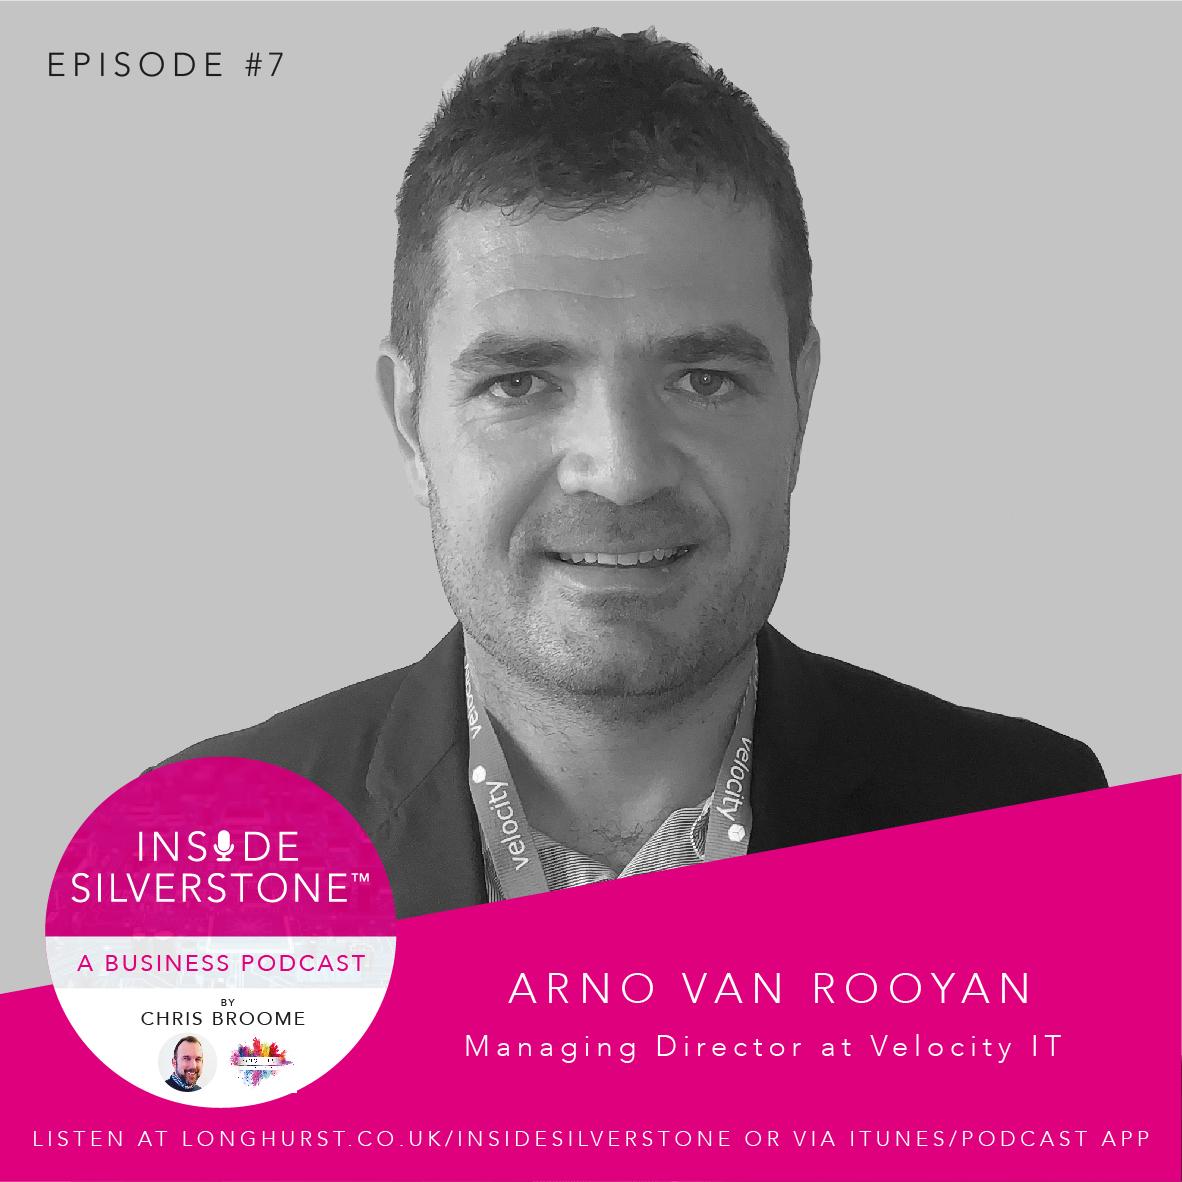 Arno van Rooyen, Managing Director of Velocity IT